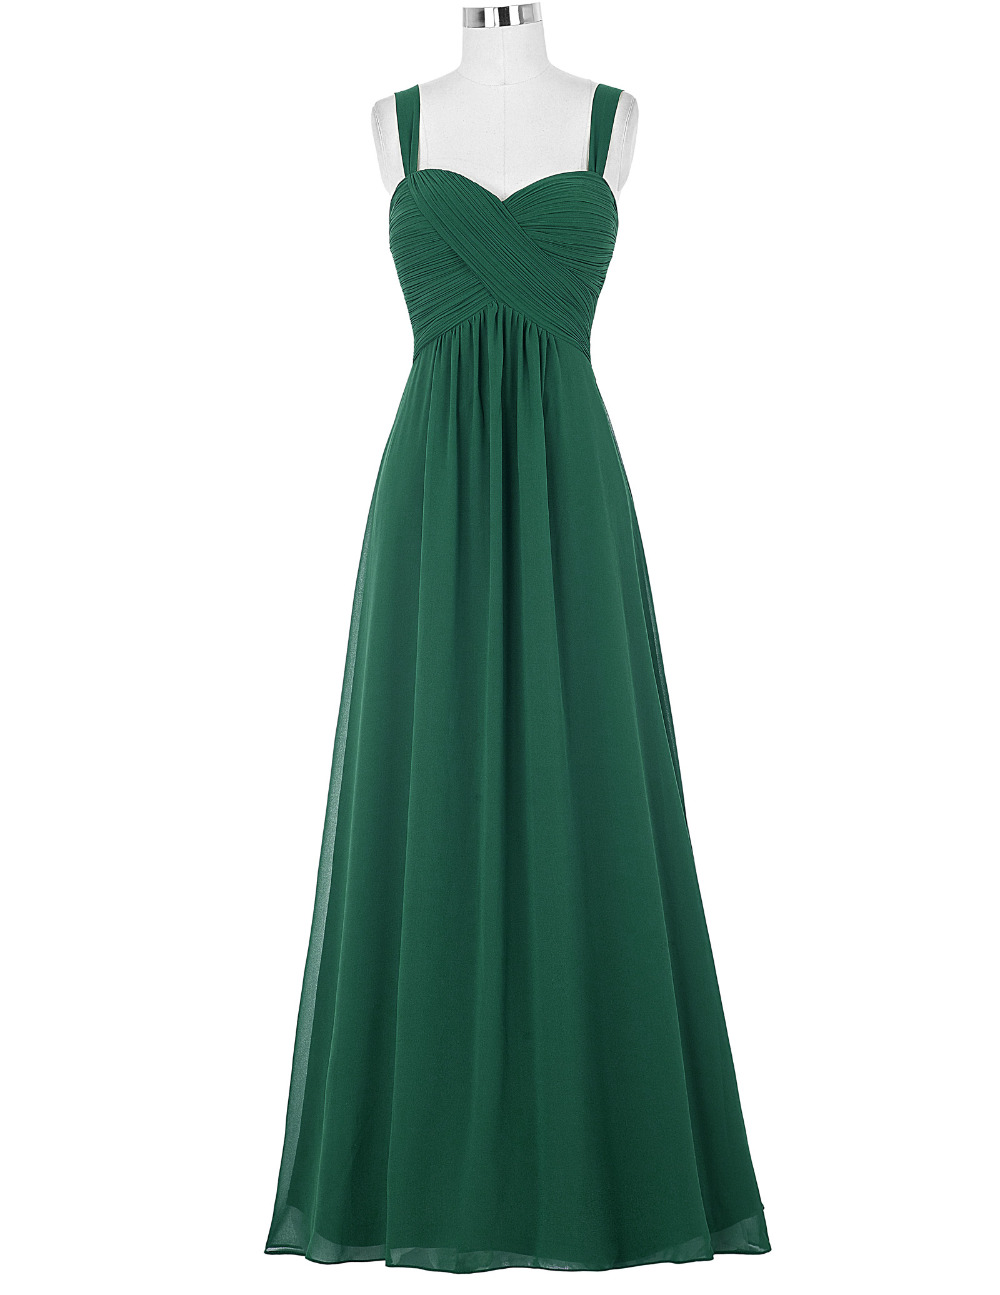 Popular emerald green wedding dress buy cheap emerald for Green wedding dresses pictures